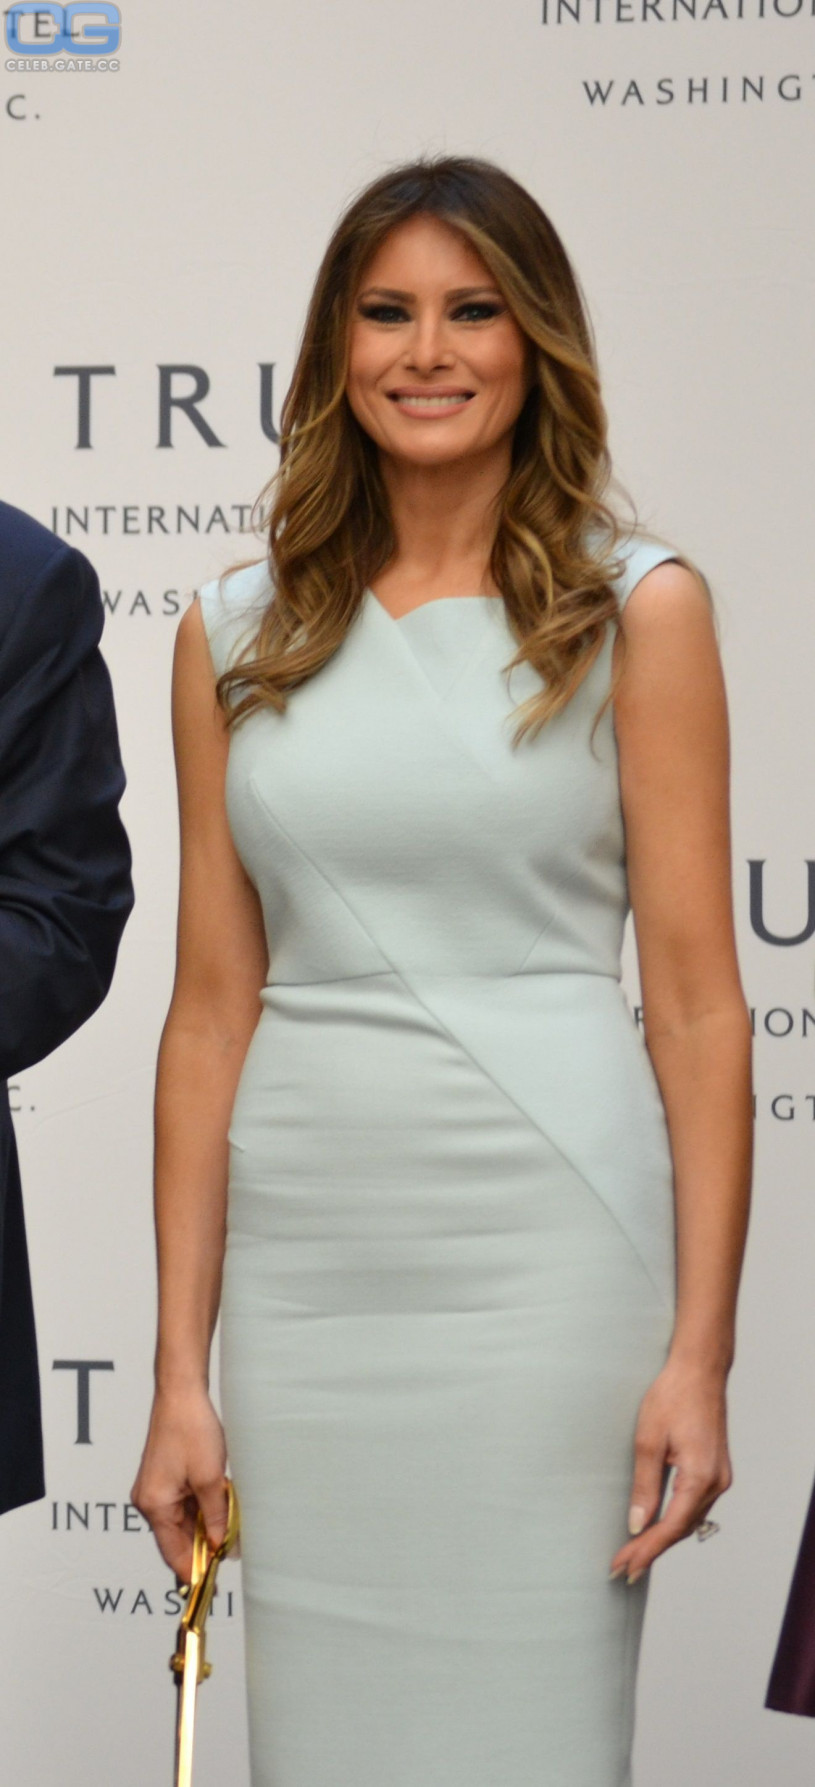 Melania Knauss Nacktbilder